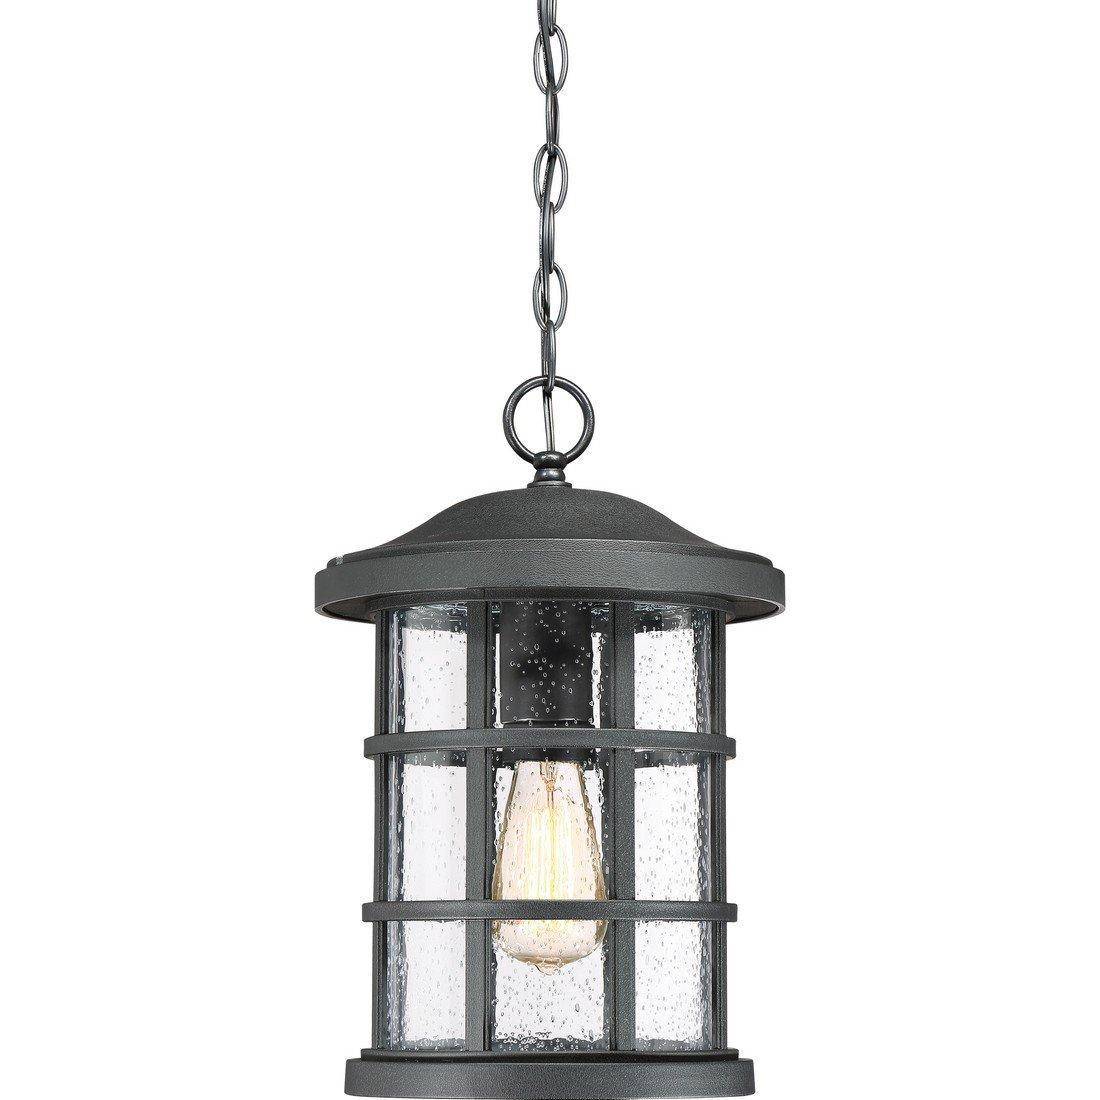 Quoizel One Light Outdoor Hanging Lantern CSE1910EK, Large, Earth Black